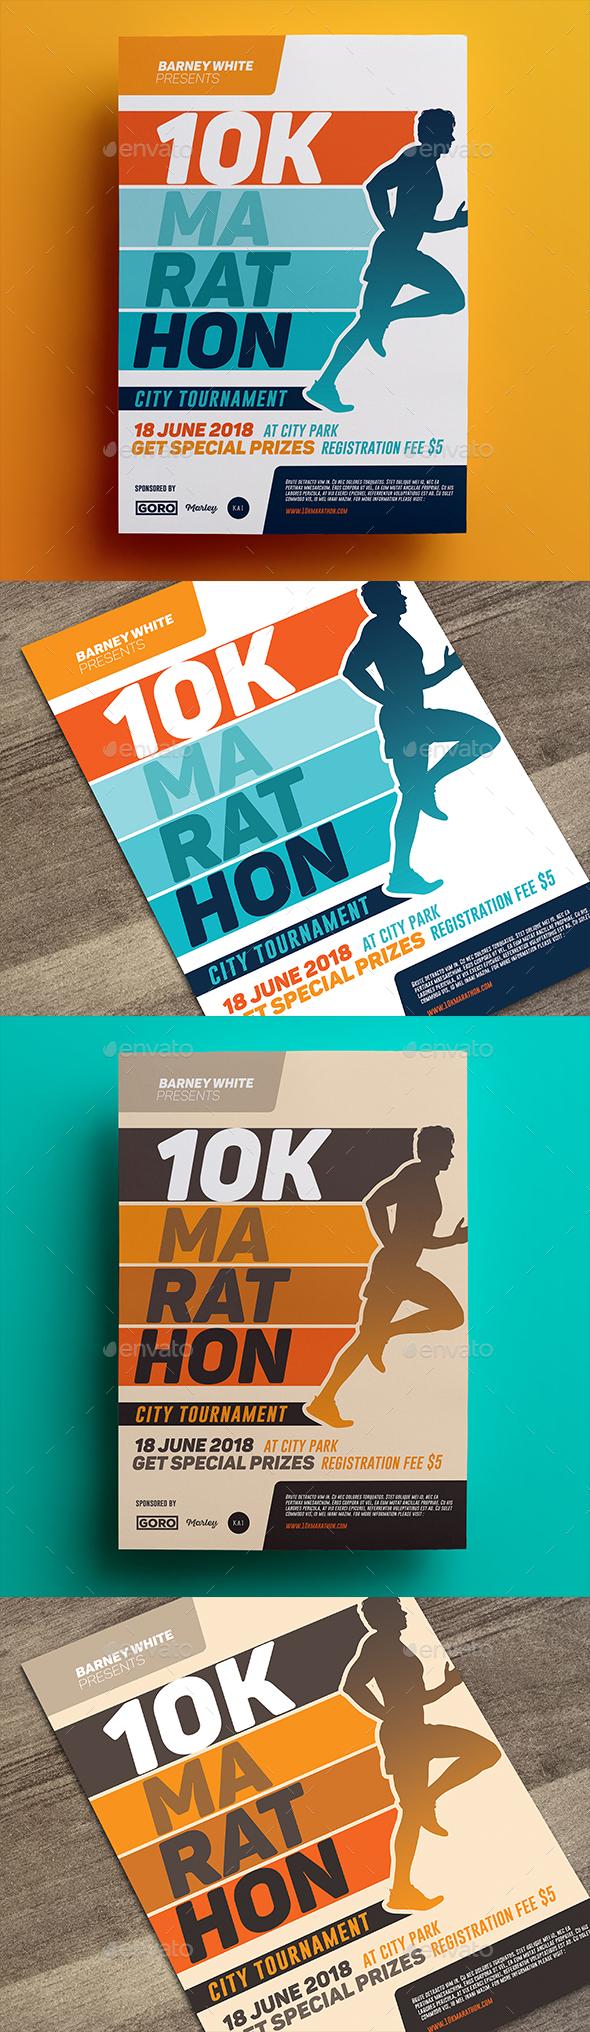 Marathon Flyer 03 - Sports Events